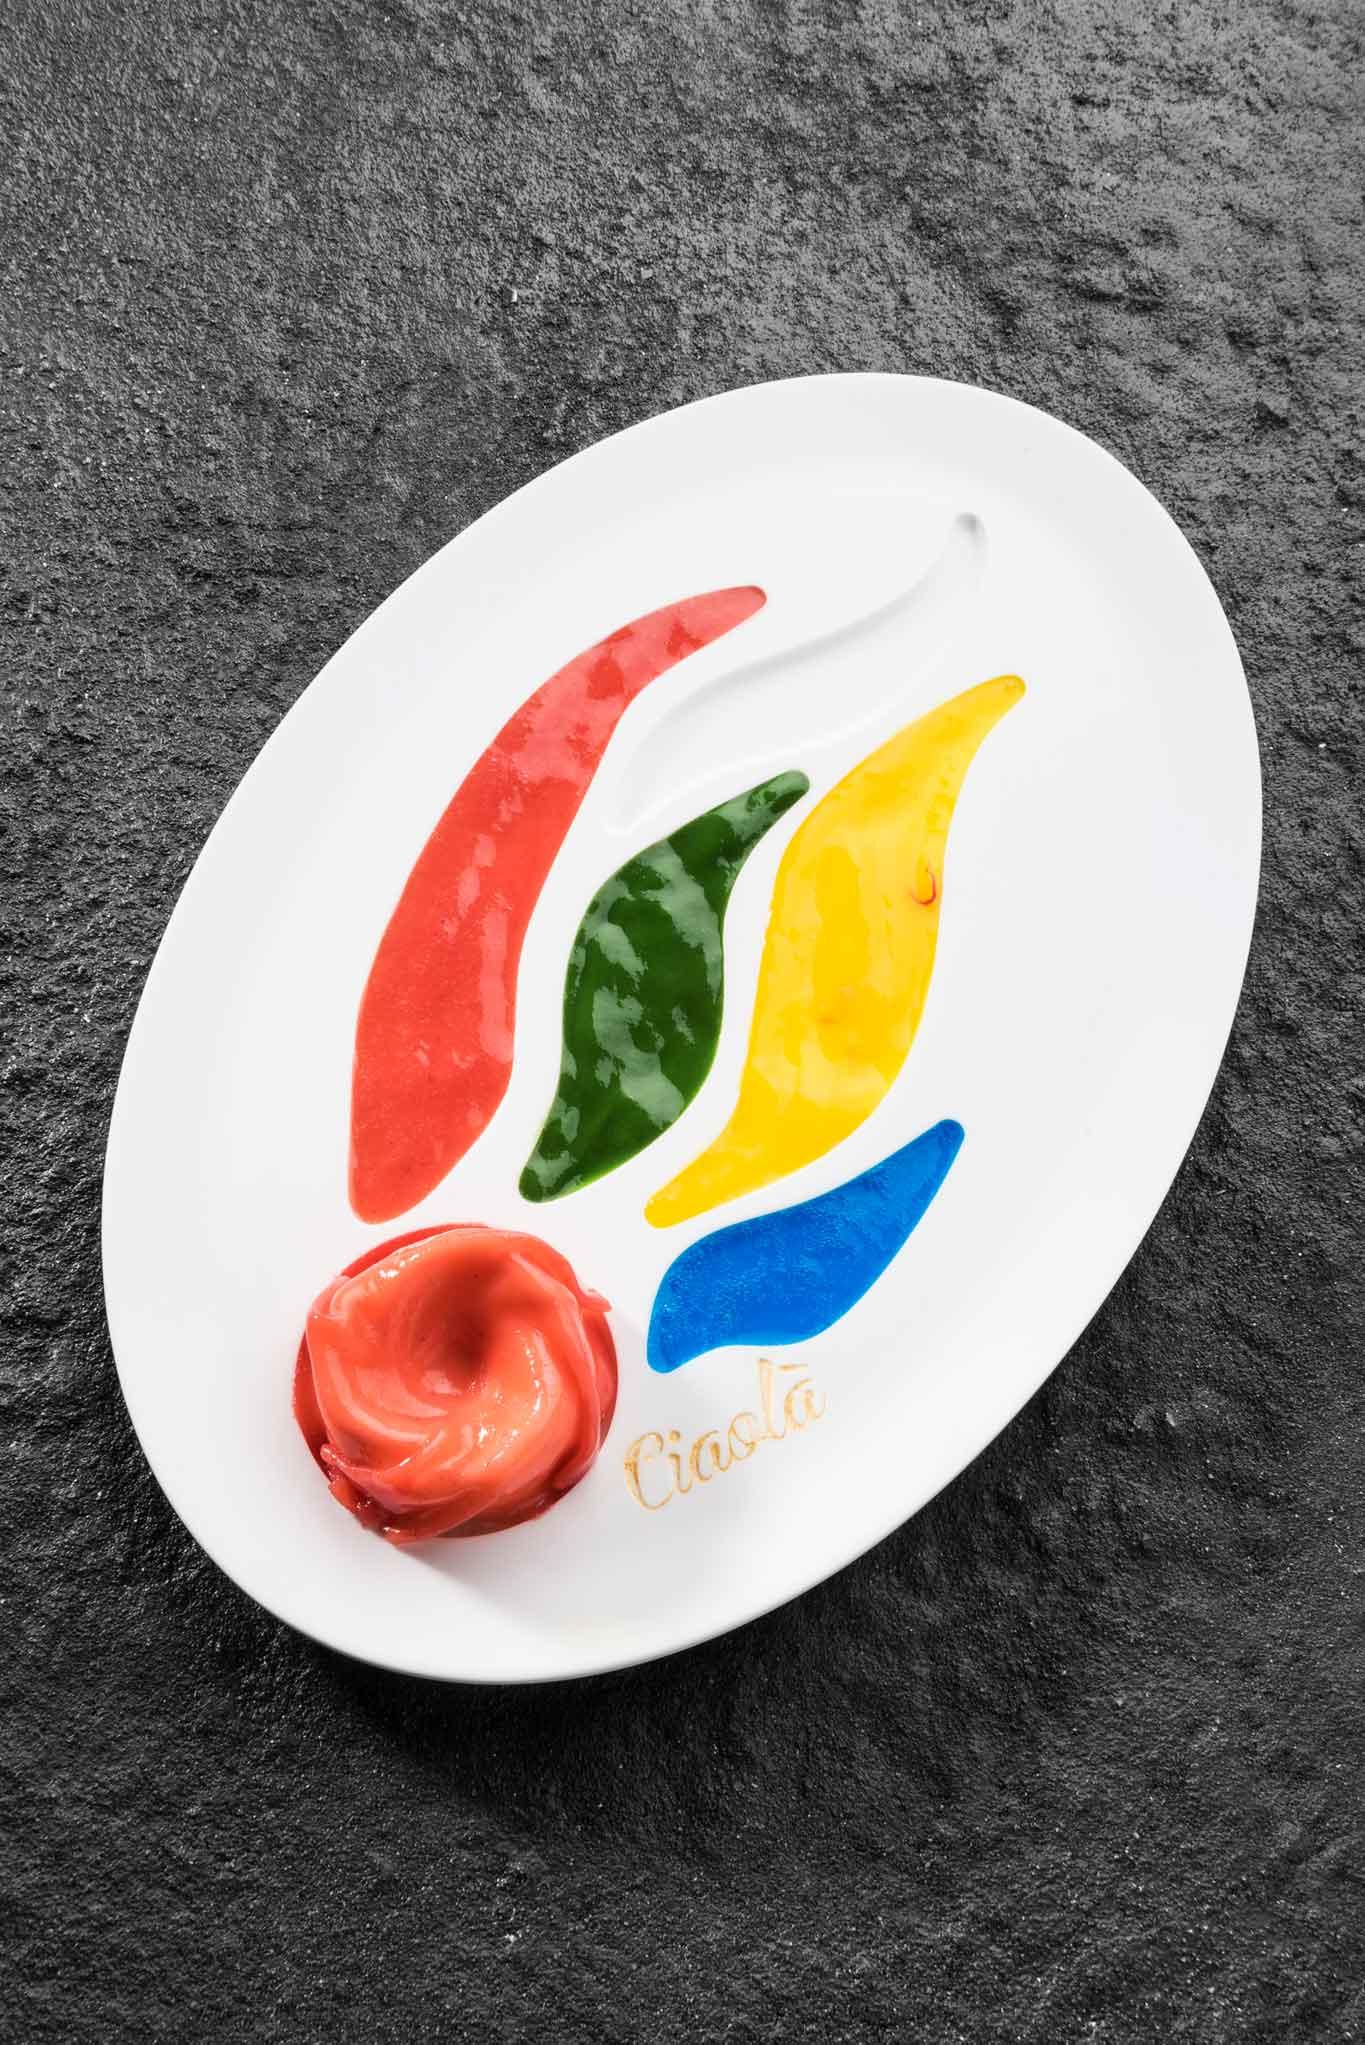 Rio 2016 Ciaolà Davide Oldani Olimpiadi